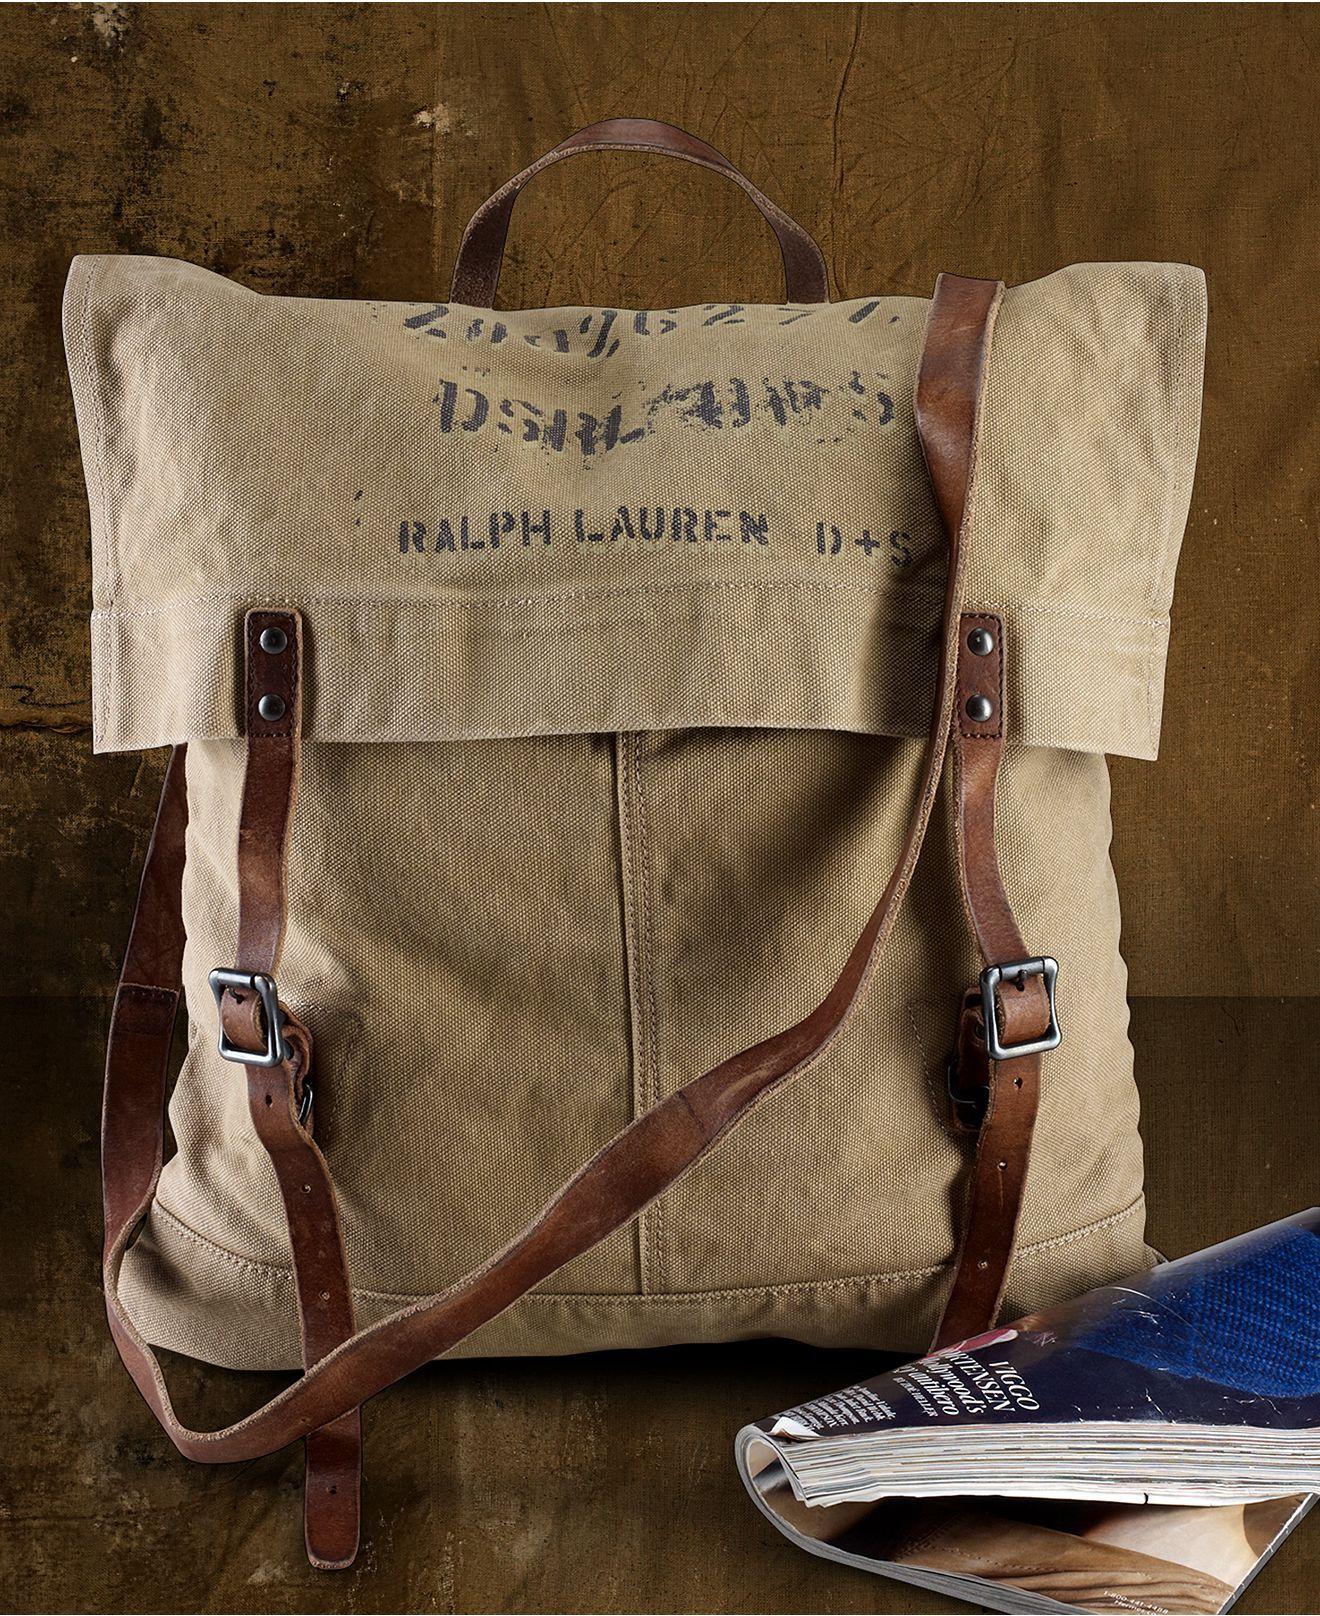 649ed63a5 Denim & Supply Ralph Lauren Bag, Luxury Long Tote | handbags in 2019 ...